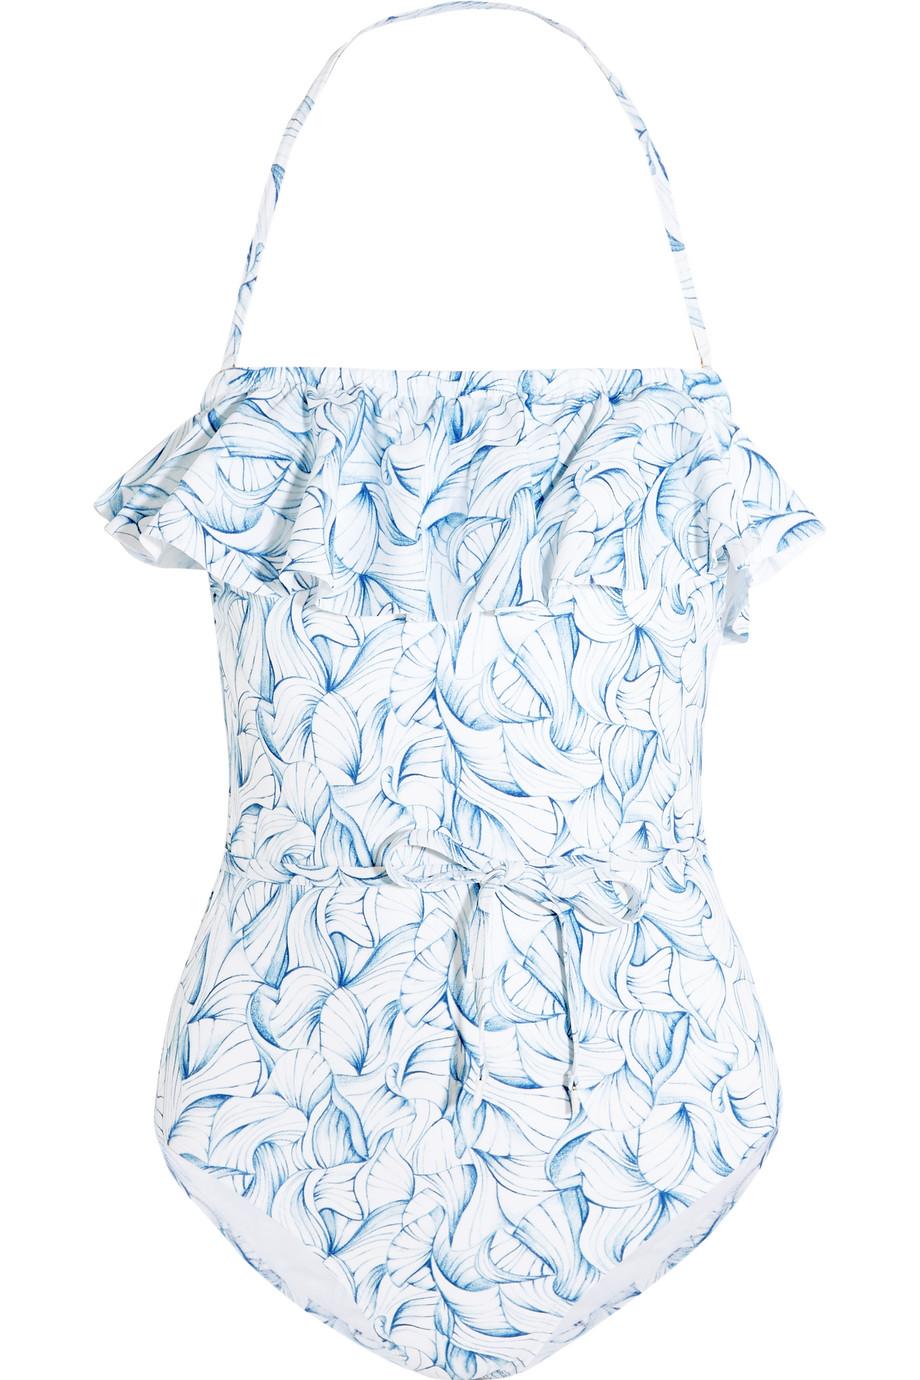 Tory Burch Sapri Ruffled Printed Swimsuit, Light Blue, Women's, Size: XS